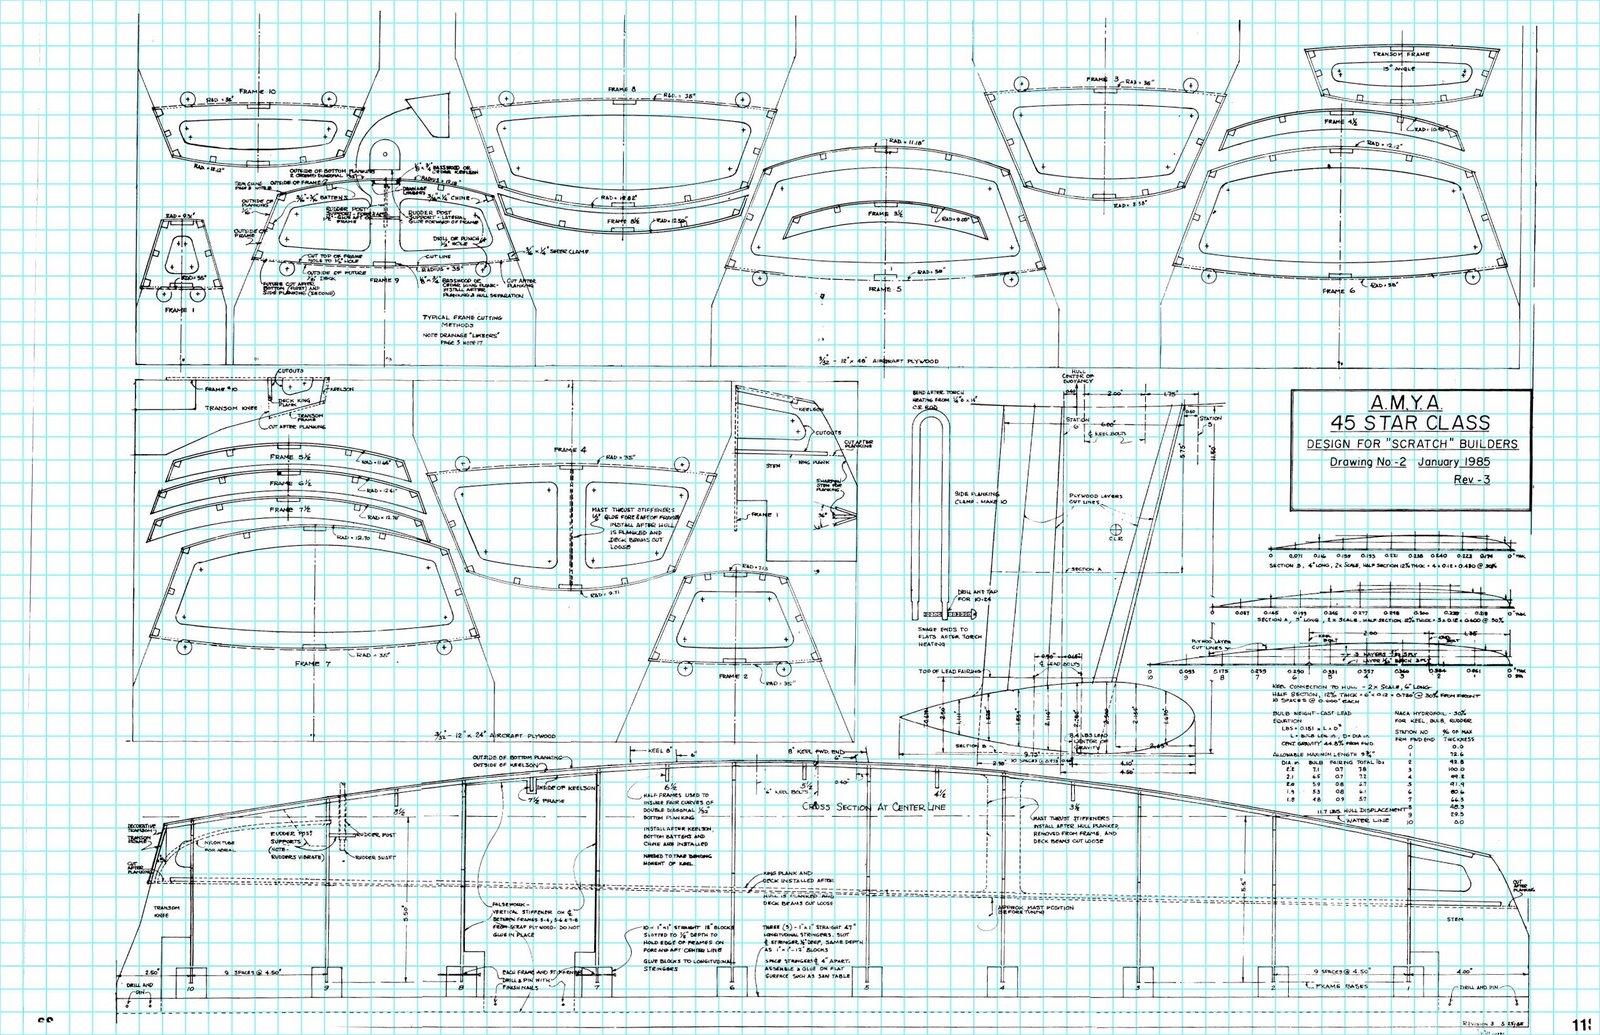 Wood Model Boat Plans Free Eager96nre